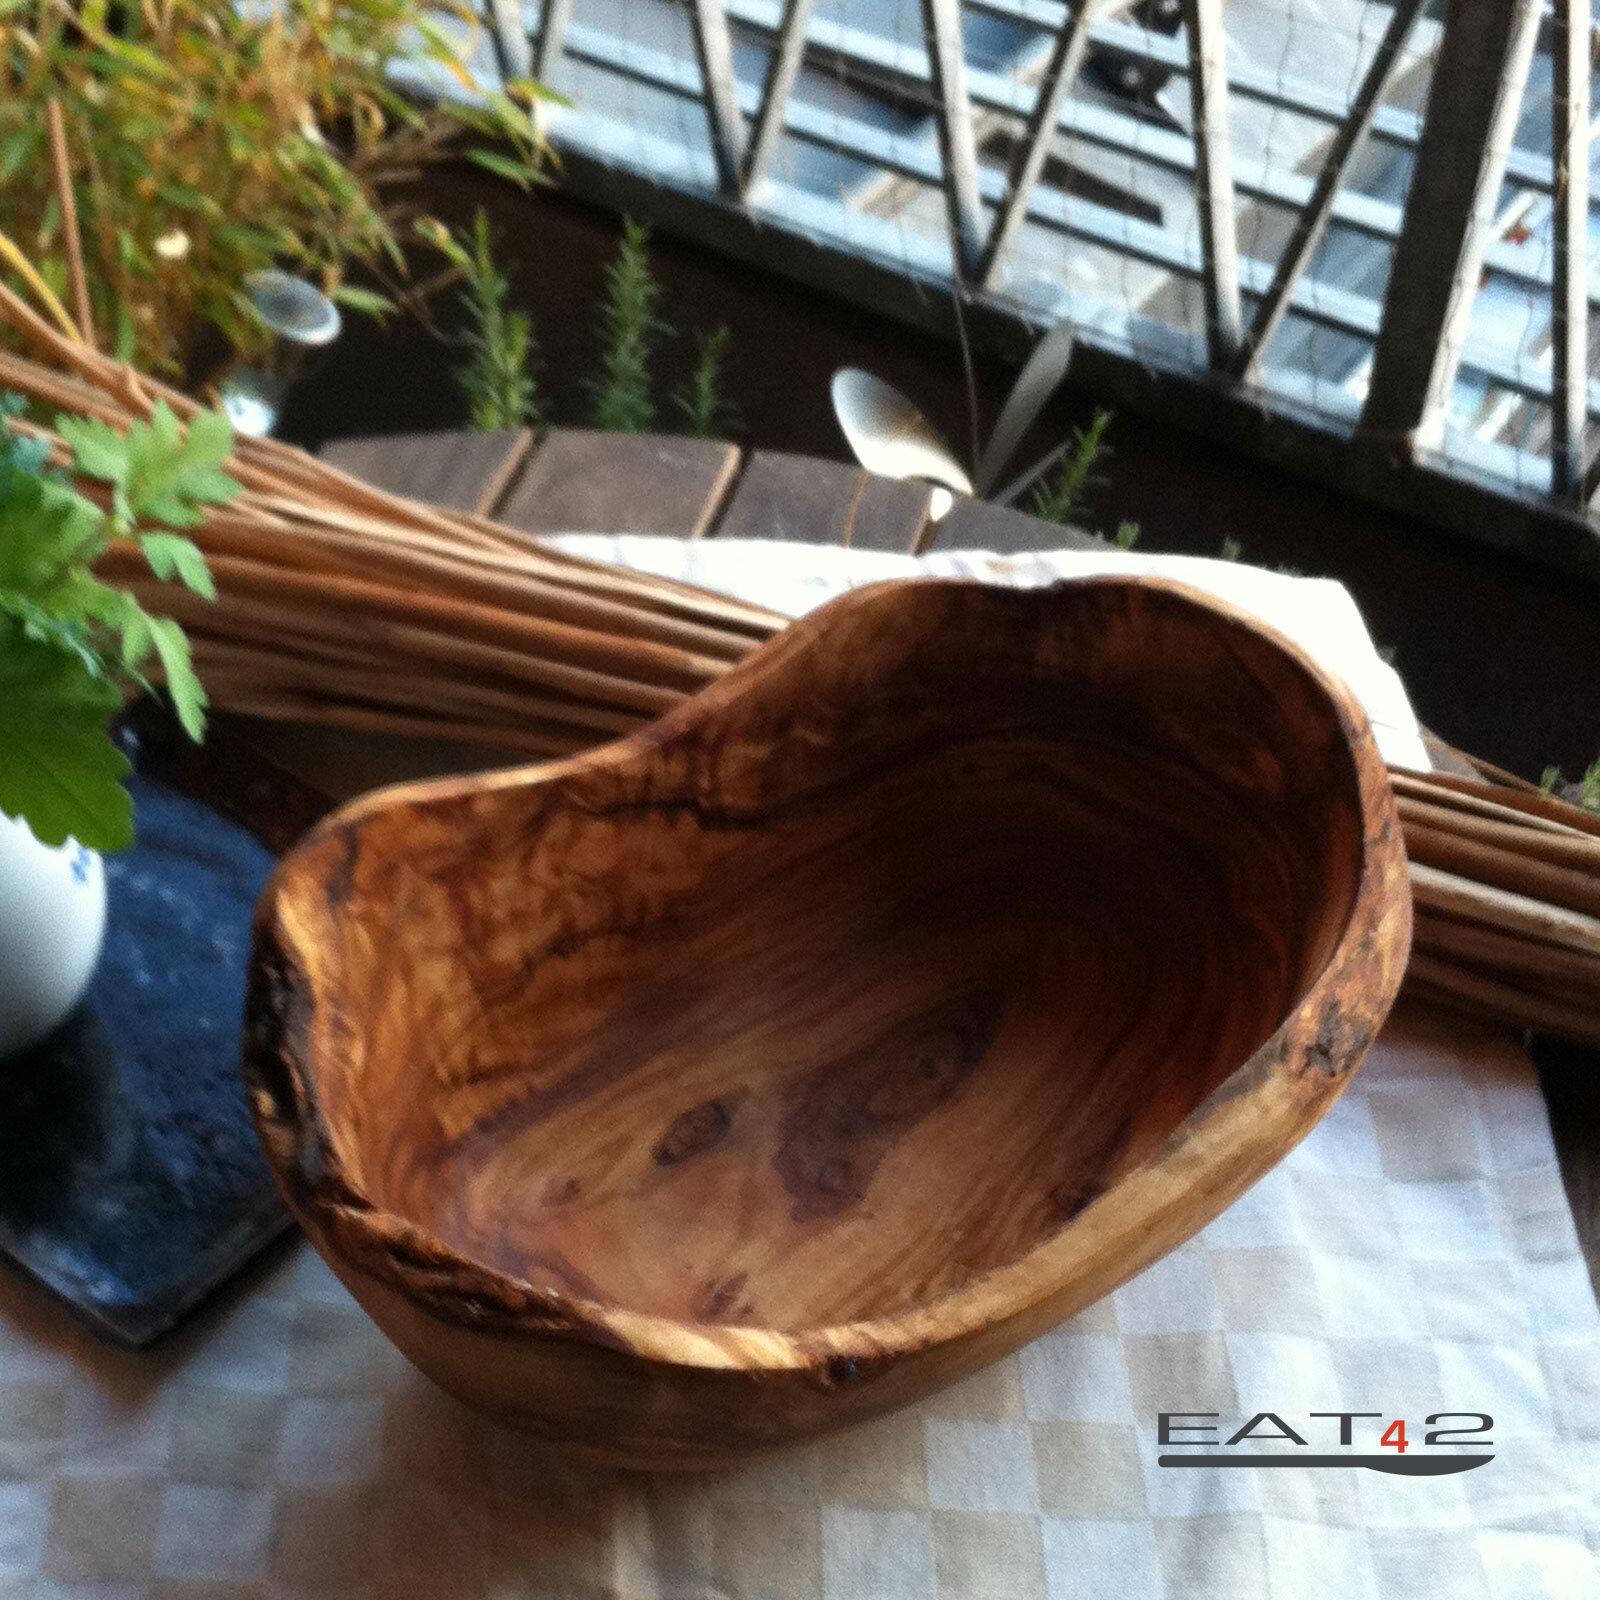 Coque bol salade de fruits fruits coquille Olivenholz bois bois bois naturform oblong grand bcee5f